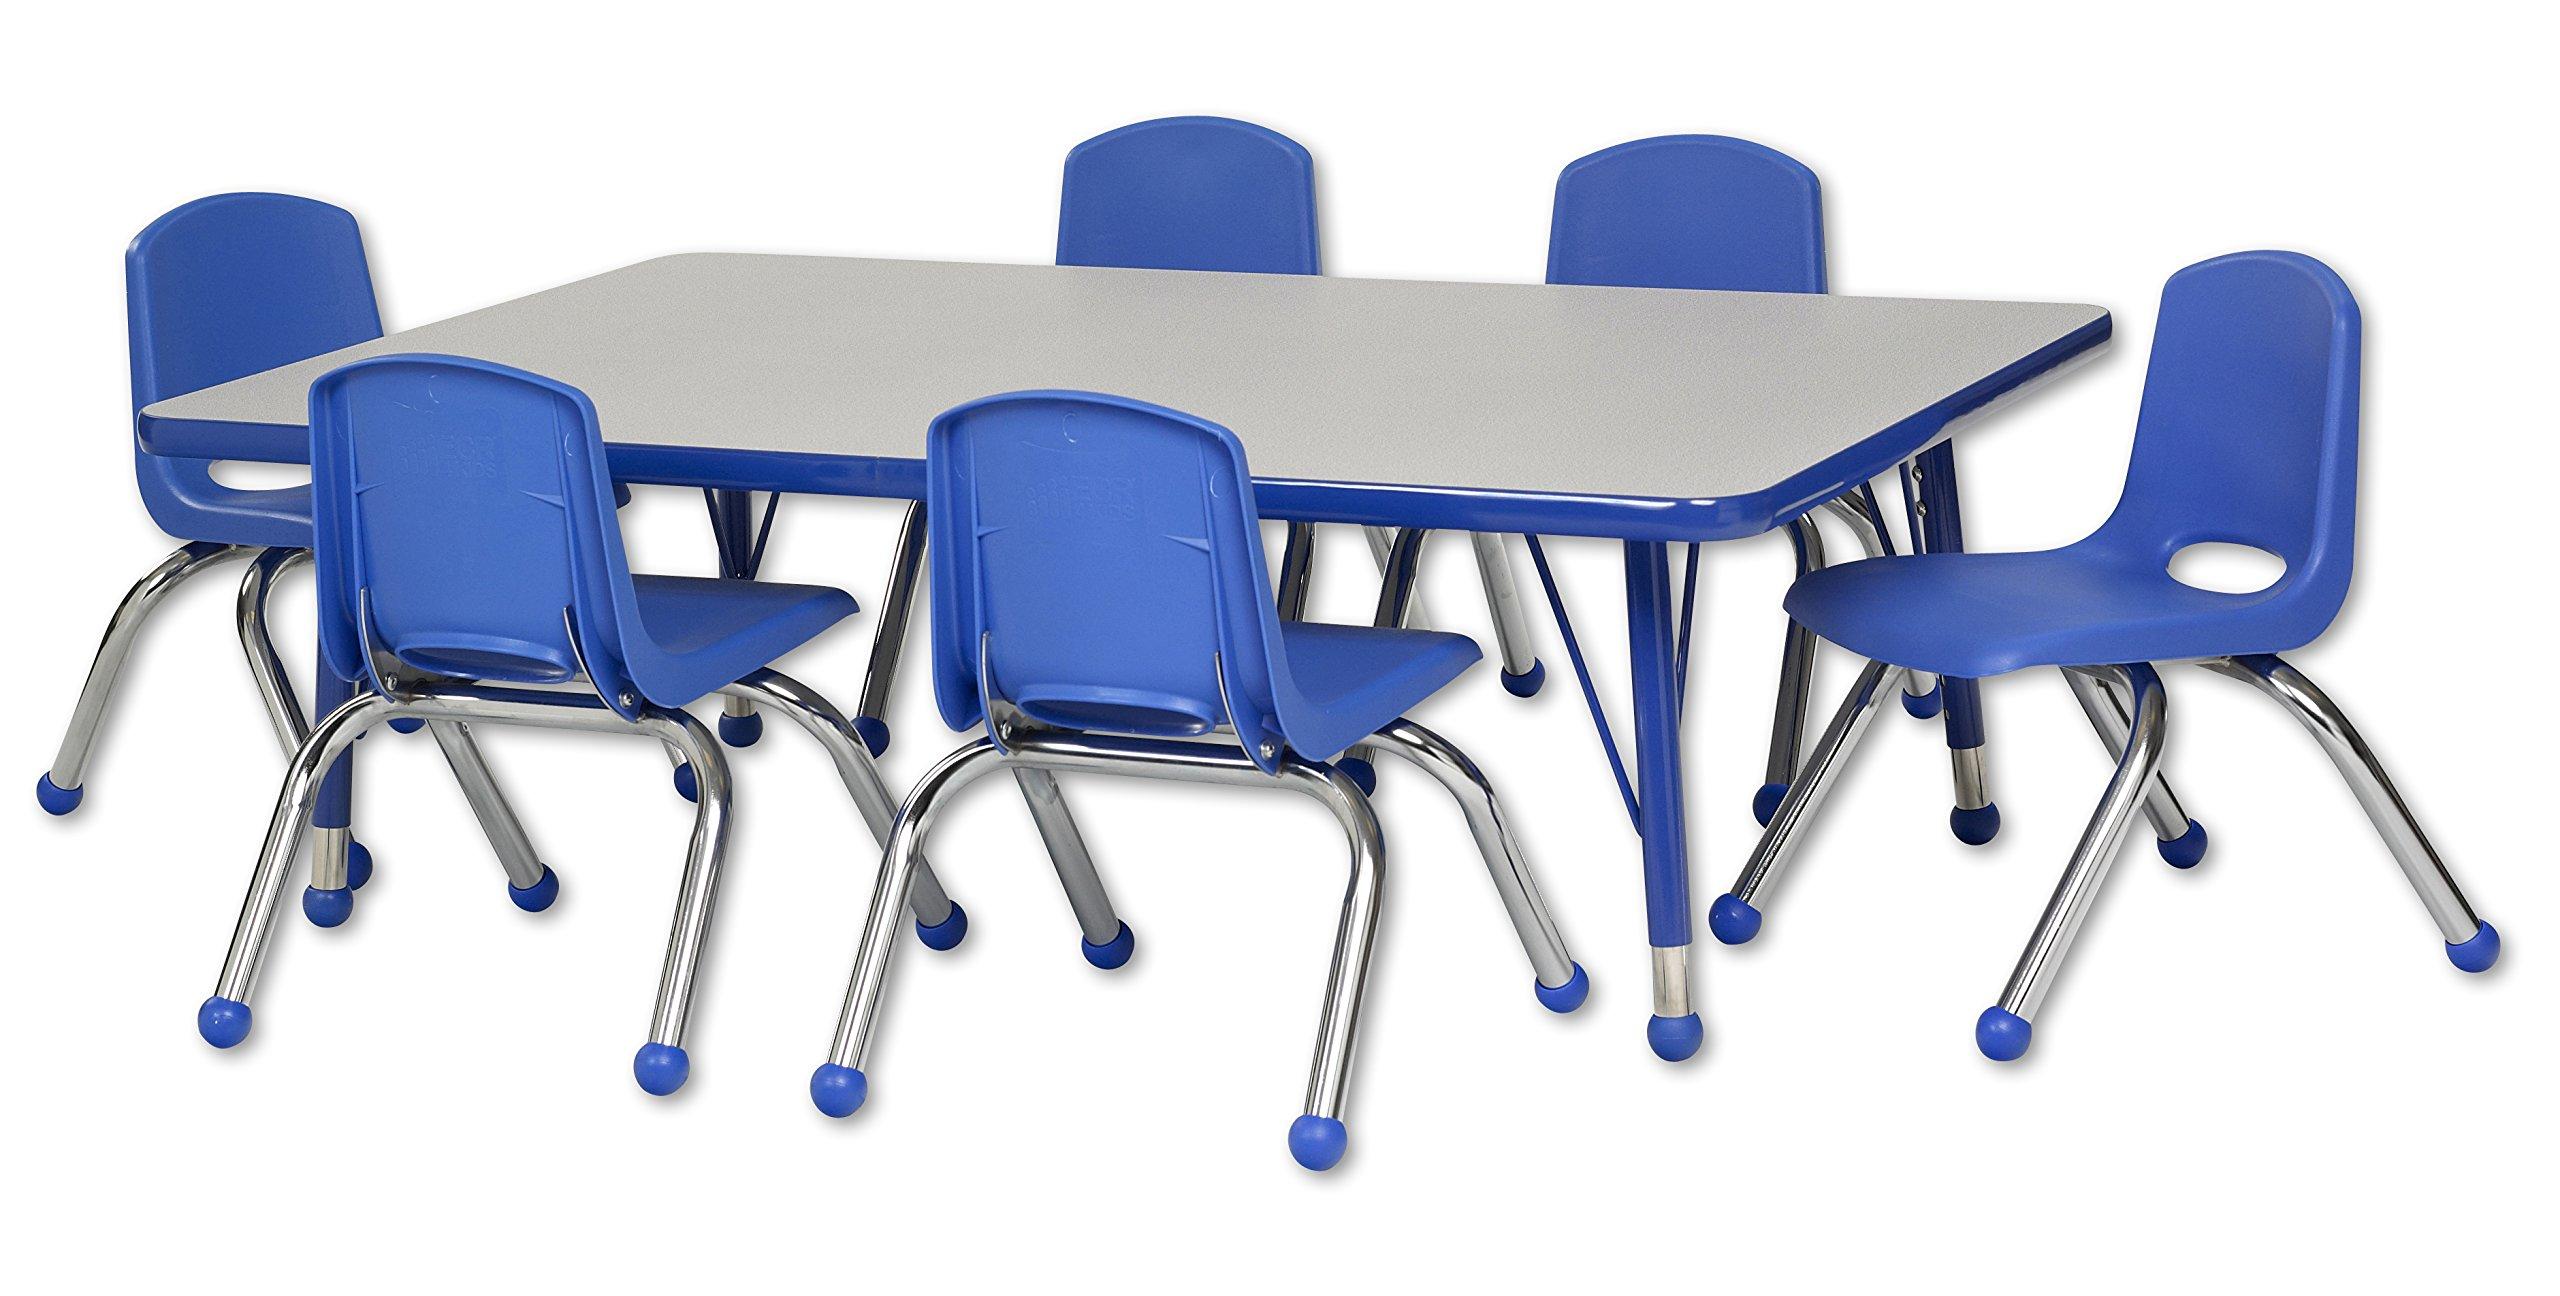 ECR4Kids 30'' x 48'' Rectangular Activity Table, Gray Top/Blue Edge, Toddler Legs/Ball Glides, Six 10'' Blue School Stack Chairs